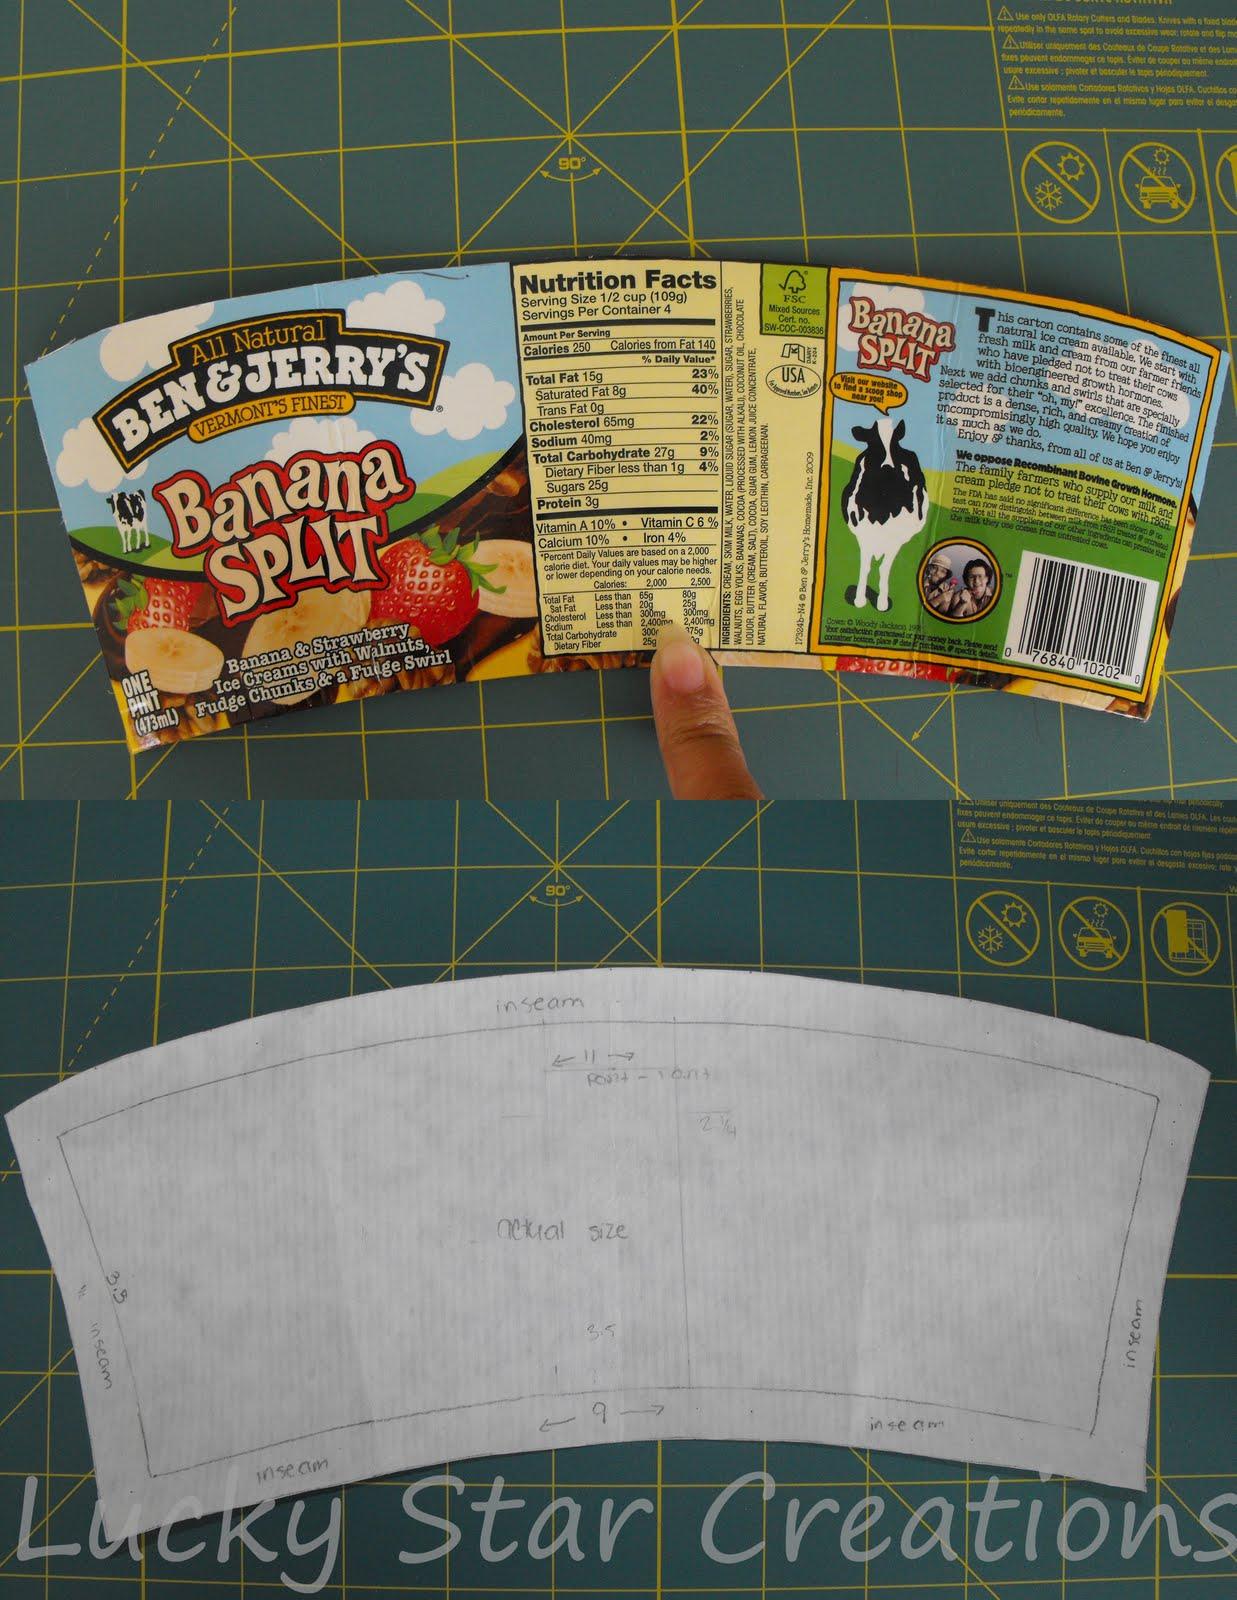 Lucky Star Creations: The Blog: Ice Cream Pint Holder